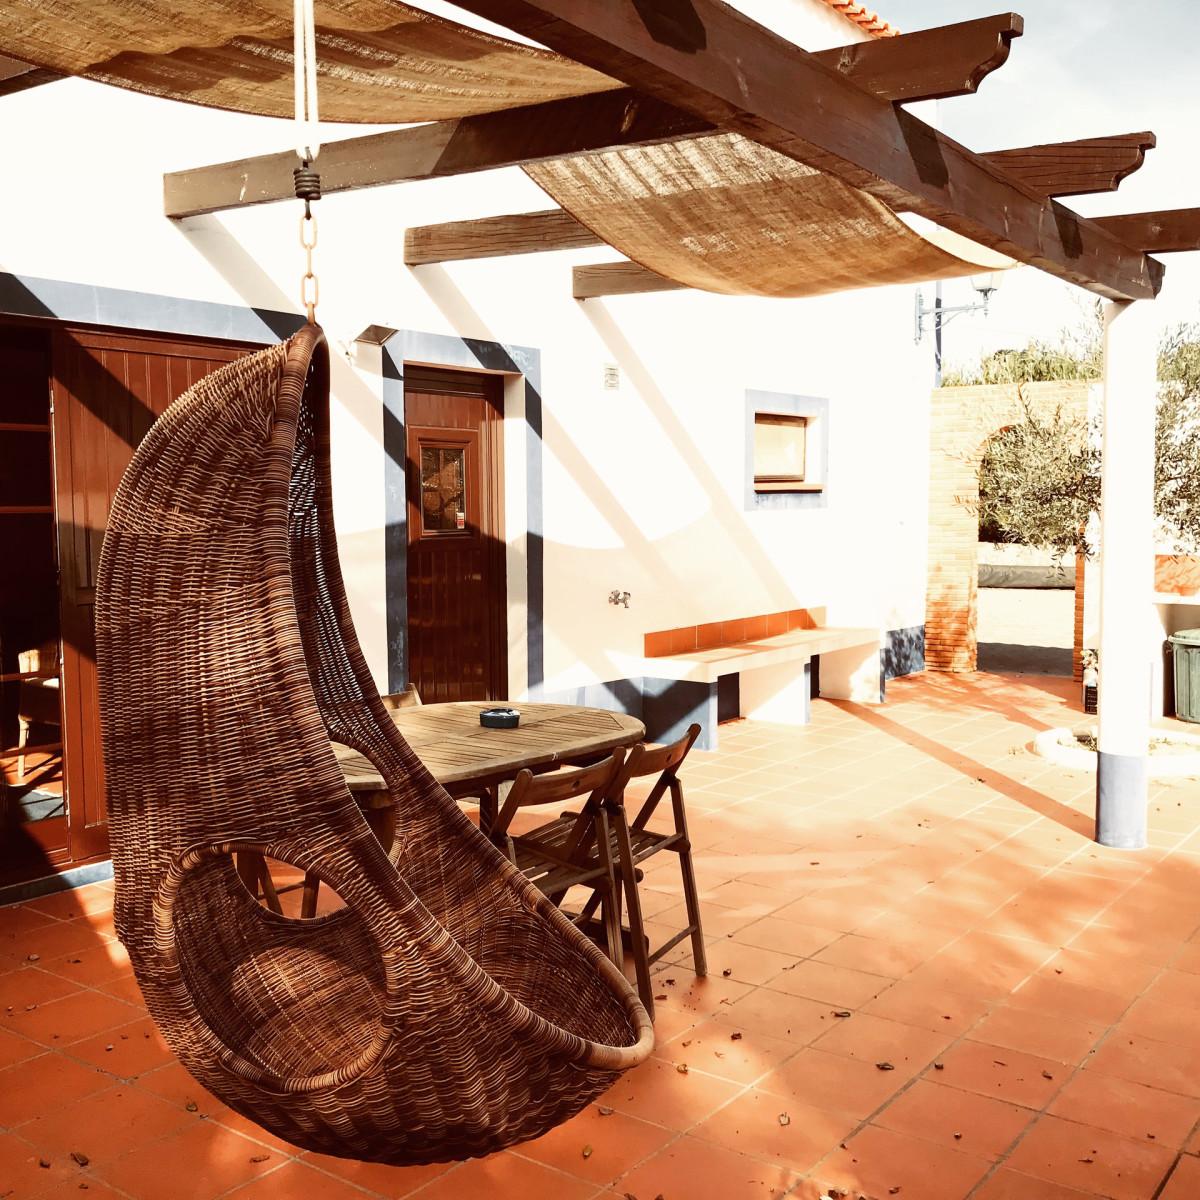 naturnah urlaub im bungalow auf dem campingplatz fewo direkt. Black Bedroom Furniture Sets. Home Design Ideas